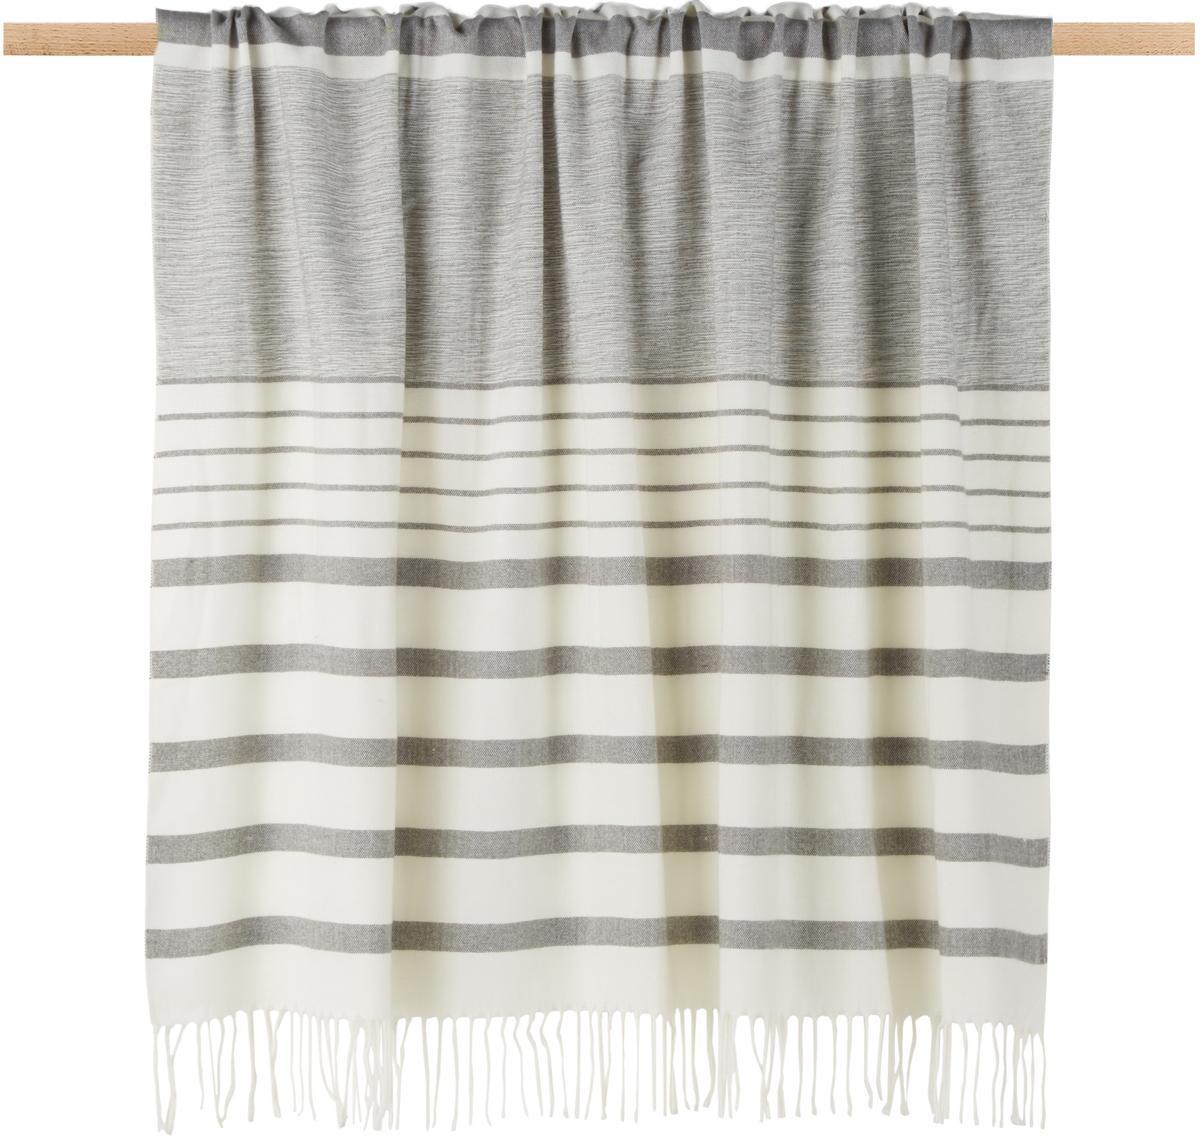 Plaid Hamam, 100% Acryl, Grau, Weiß, 130 x 170 cm